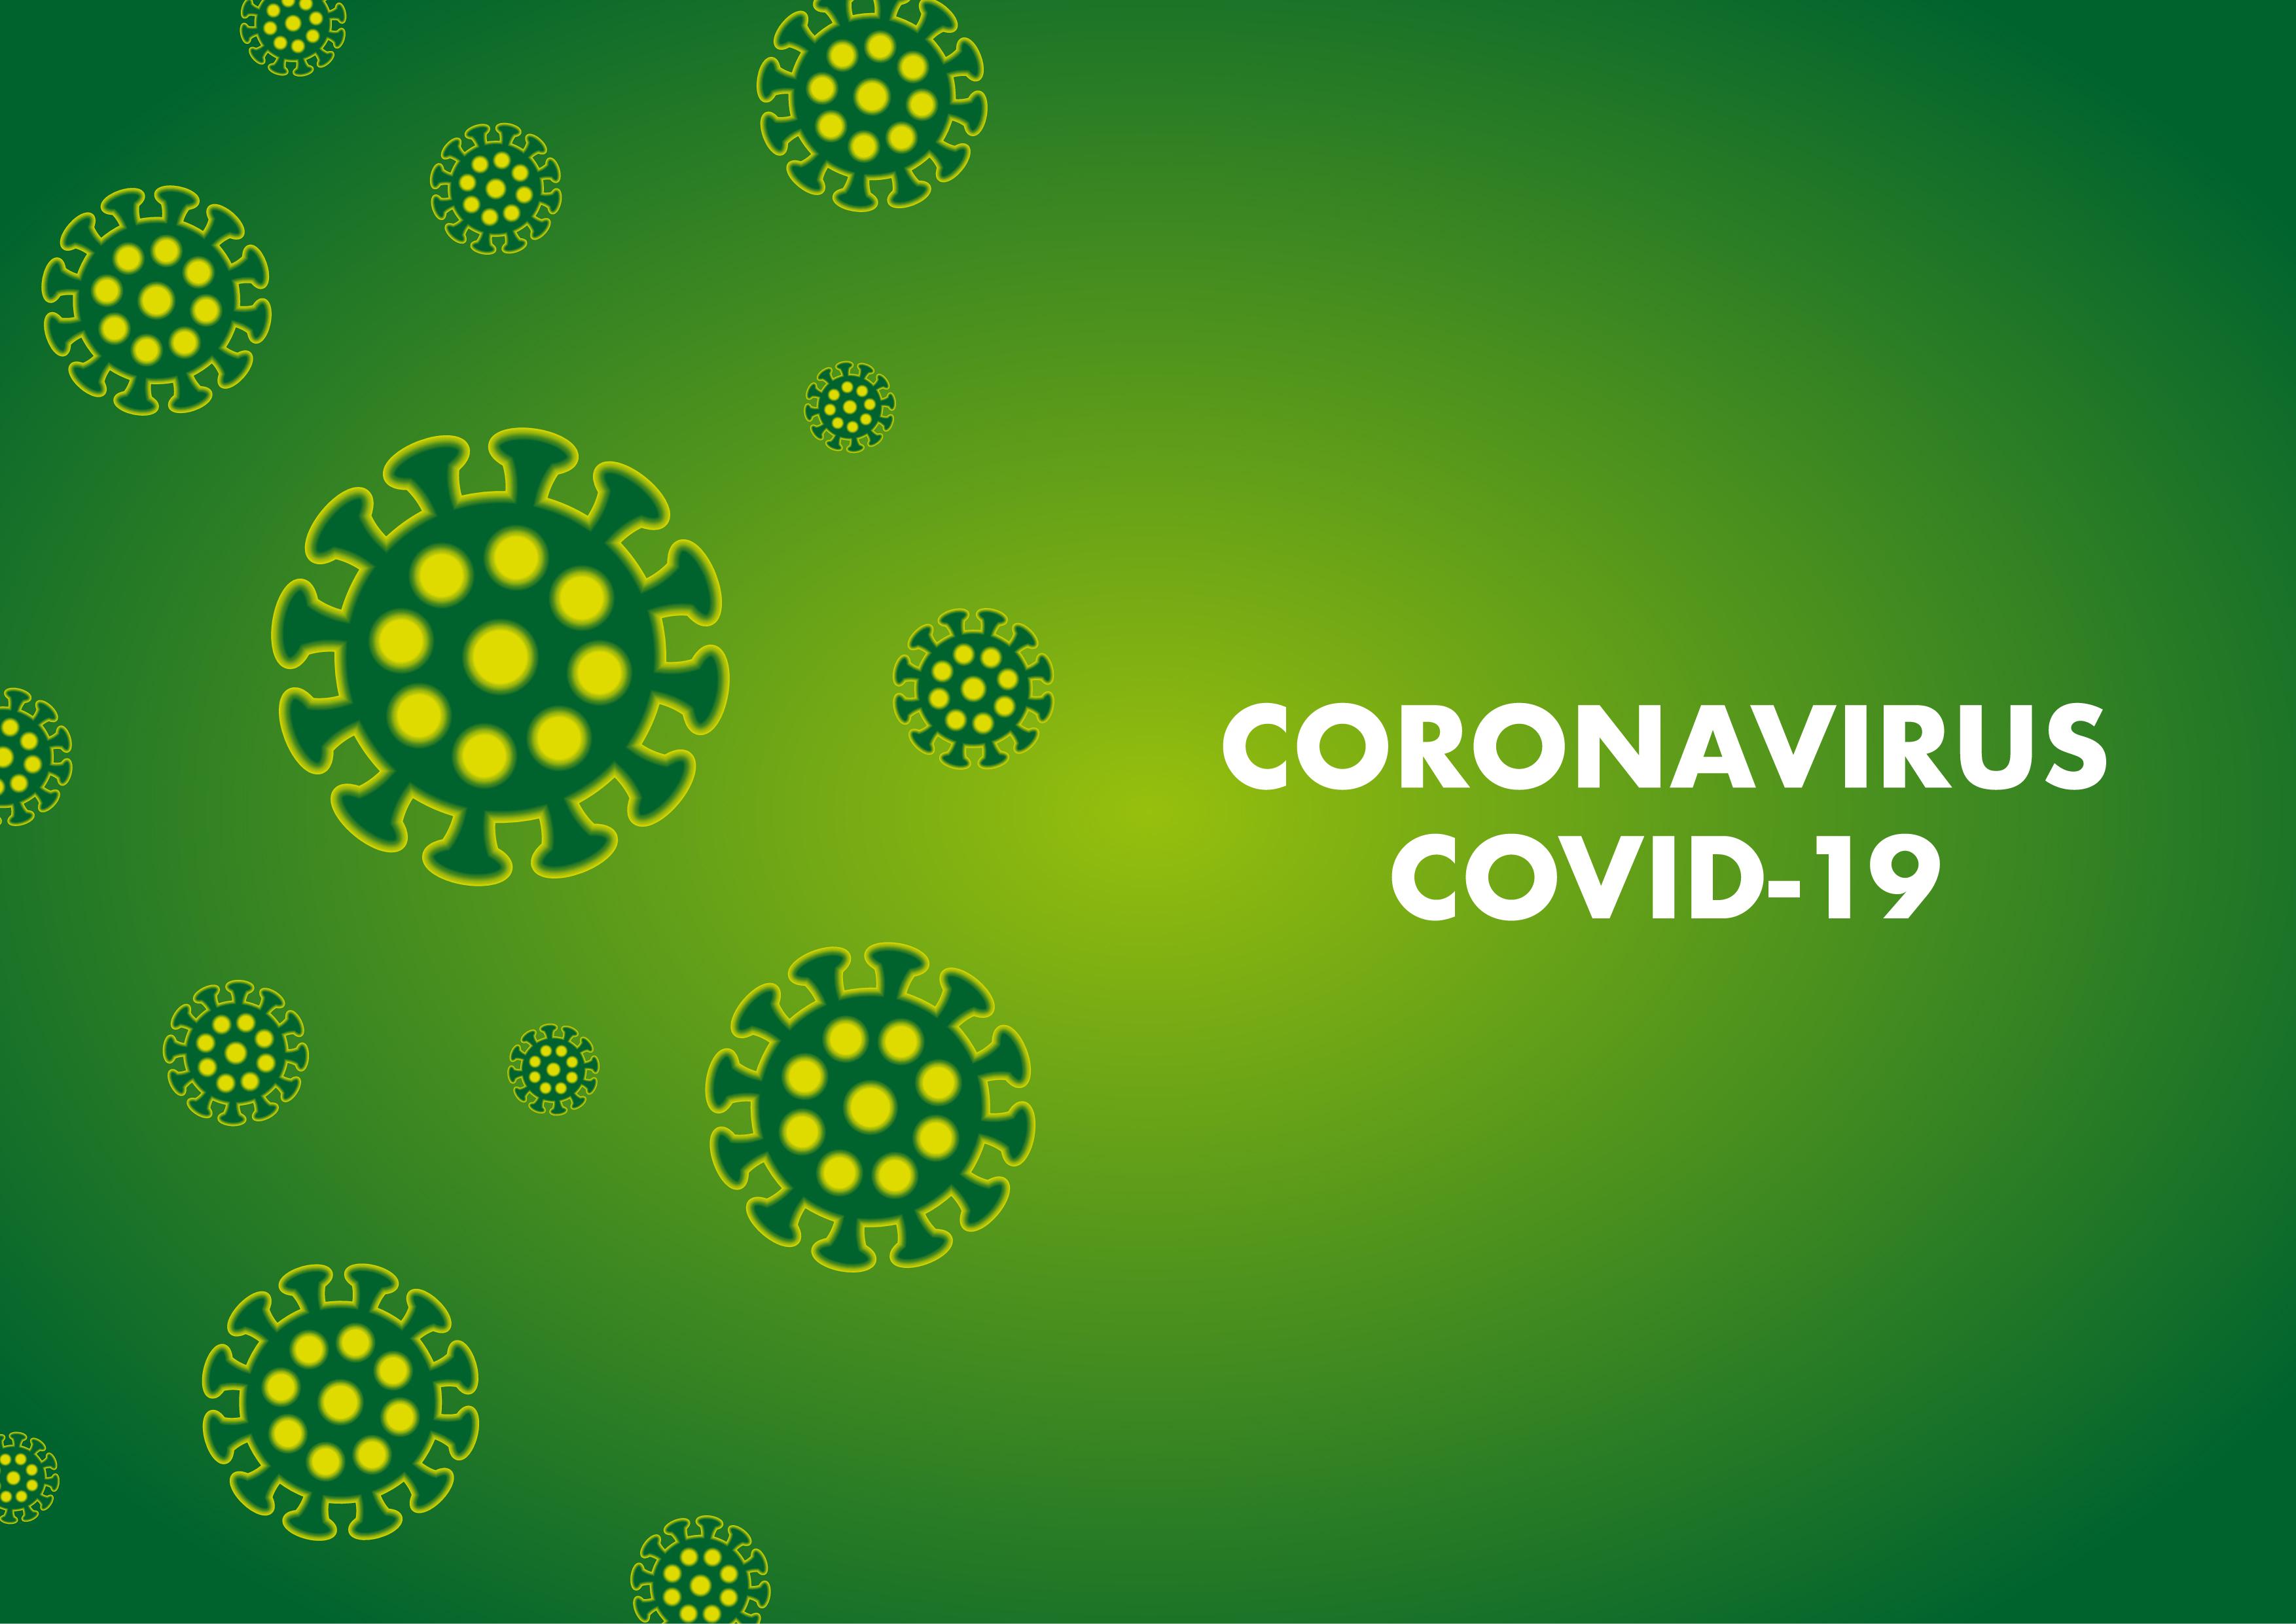 CoronaVirus thumb 360 x 240